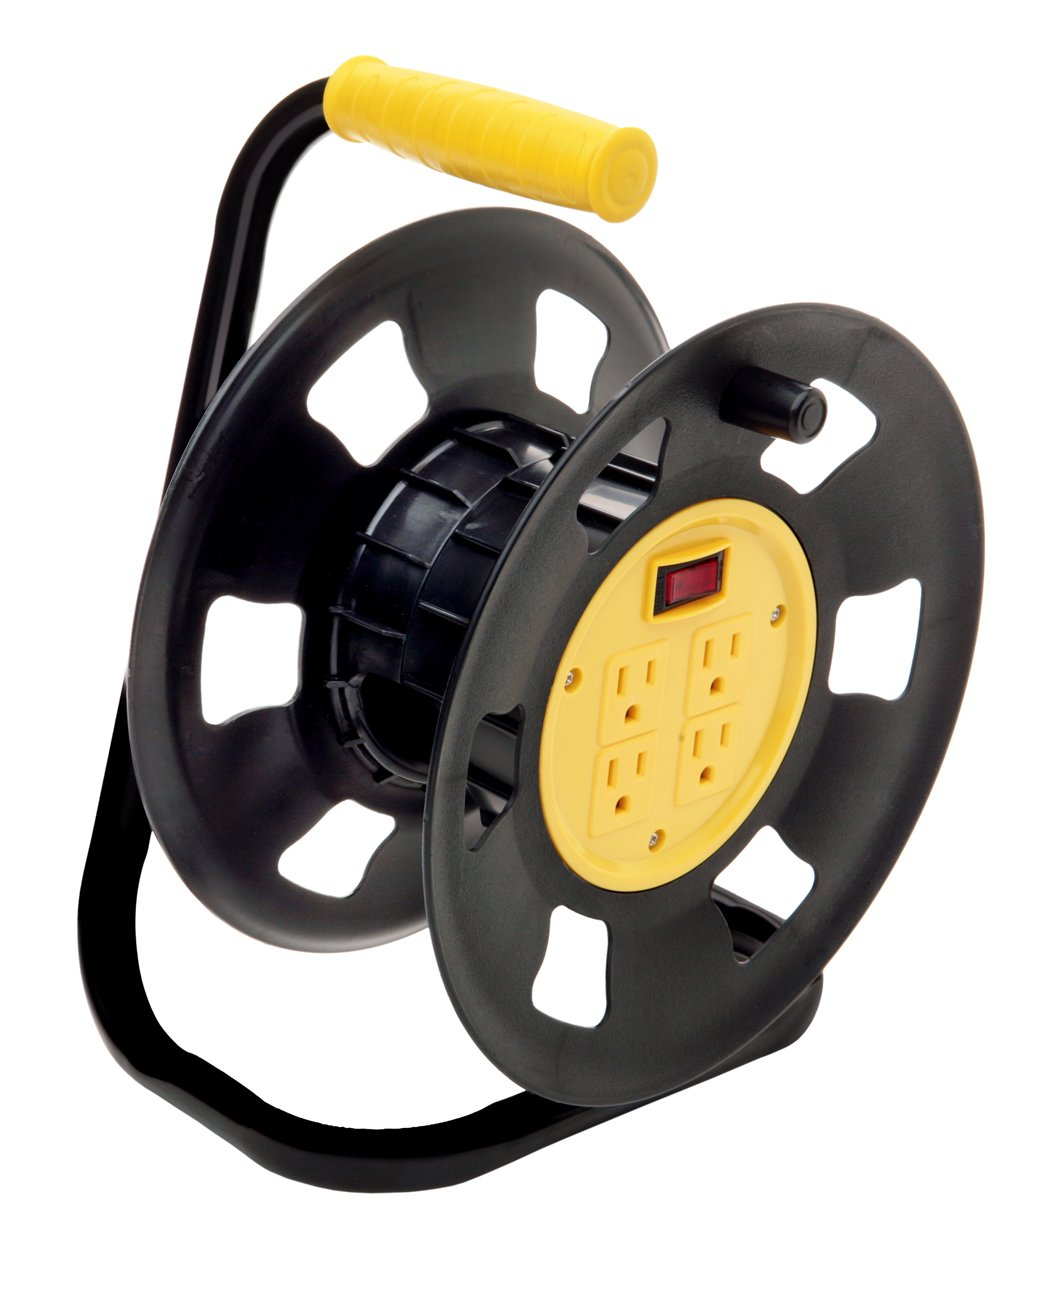 Amazon.com: Designers Edge E230 Extension Cord Storage Reel, Multi Outlet  Adapter, Black/Yellow: Home Improvement